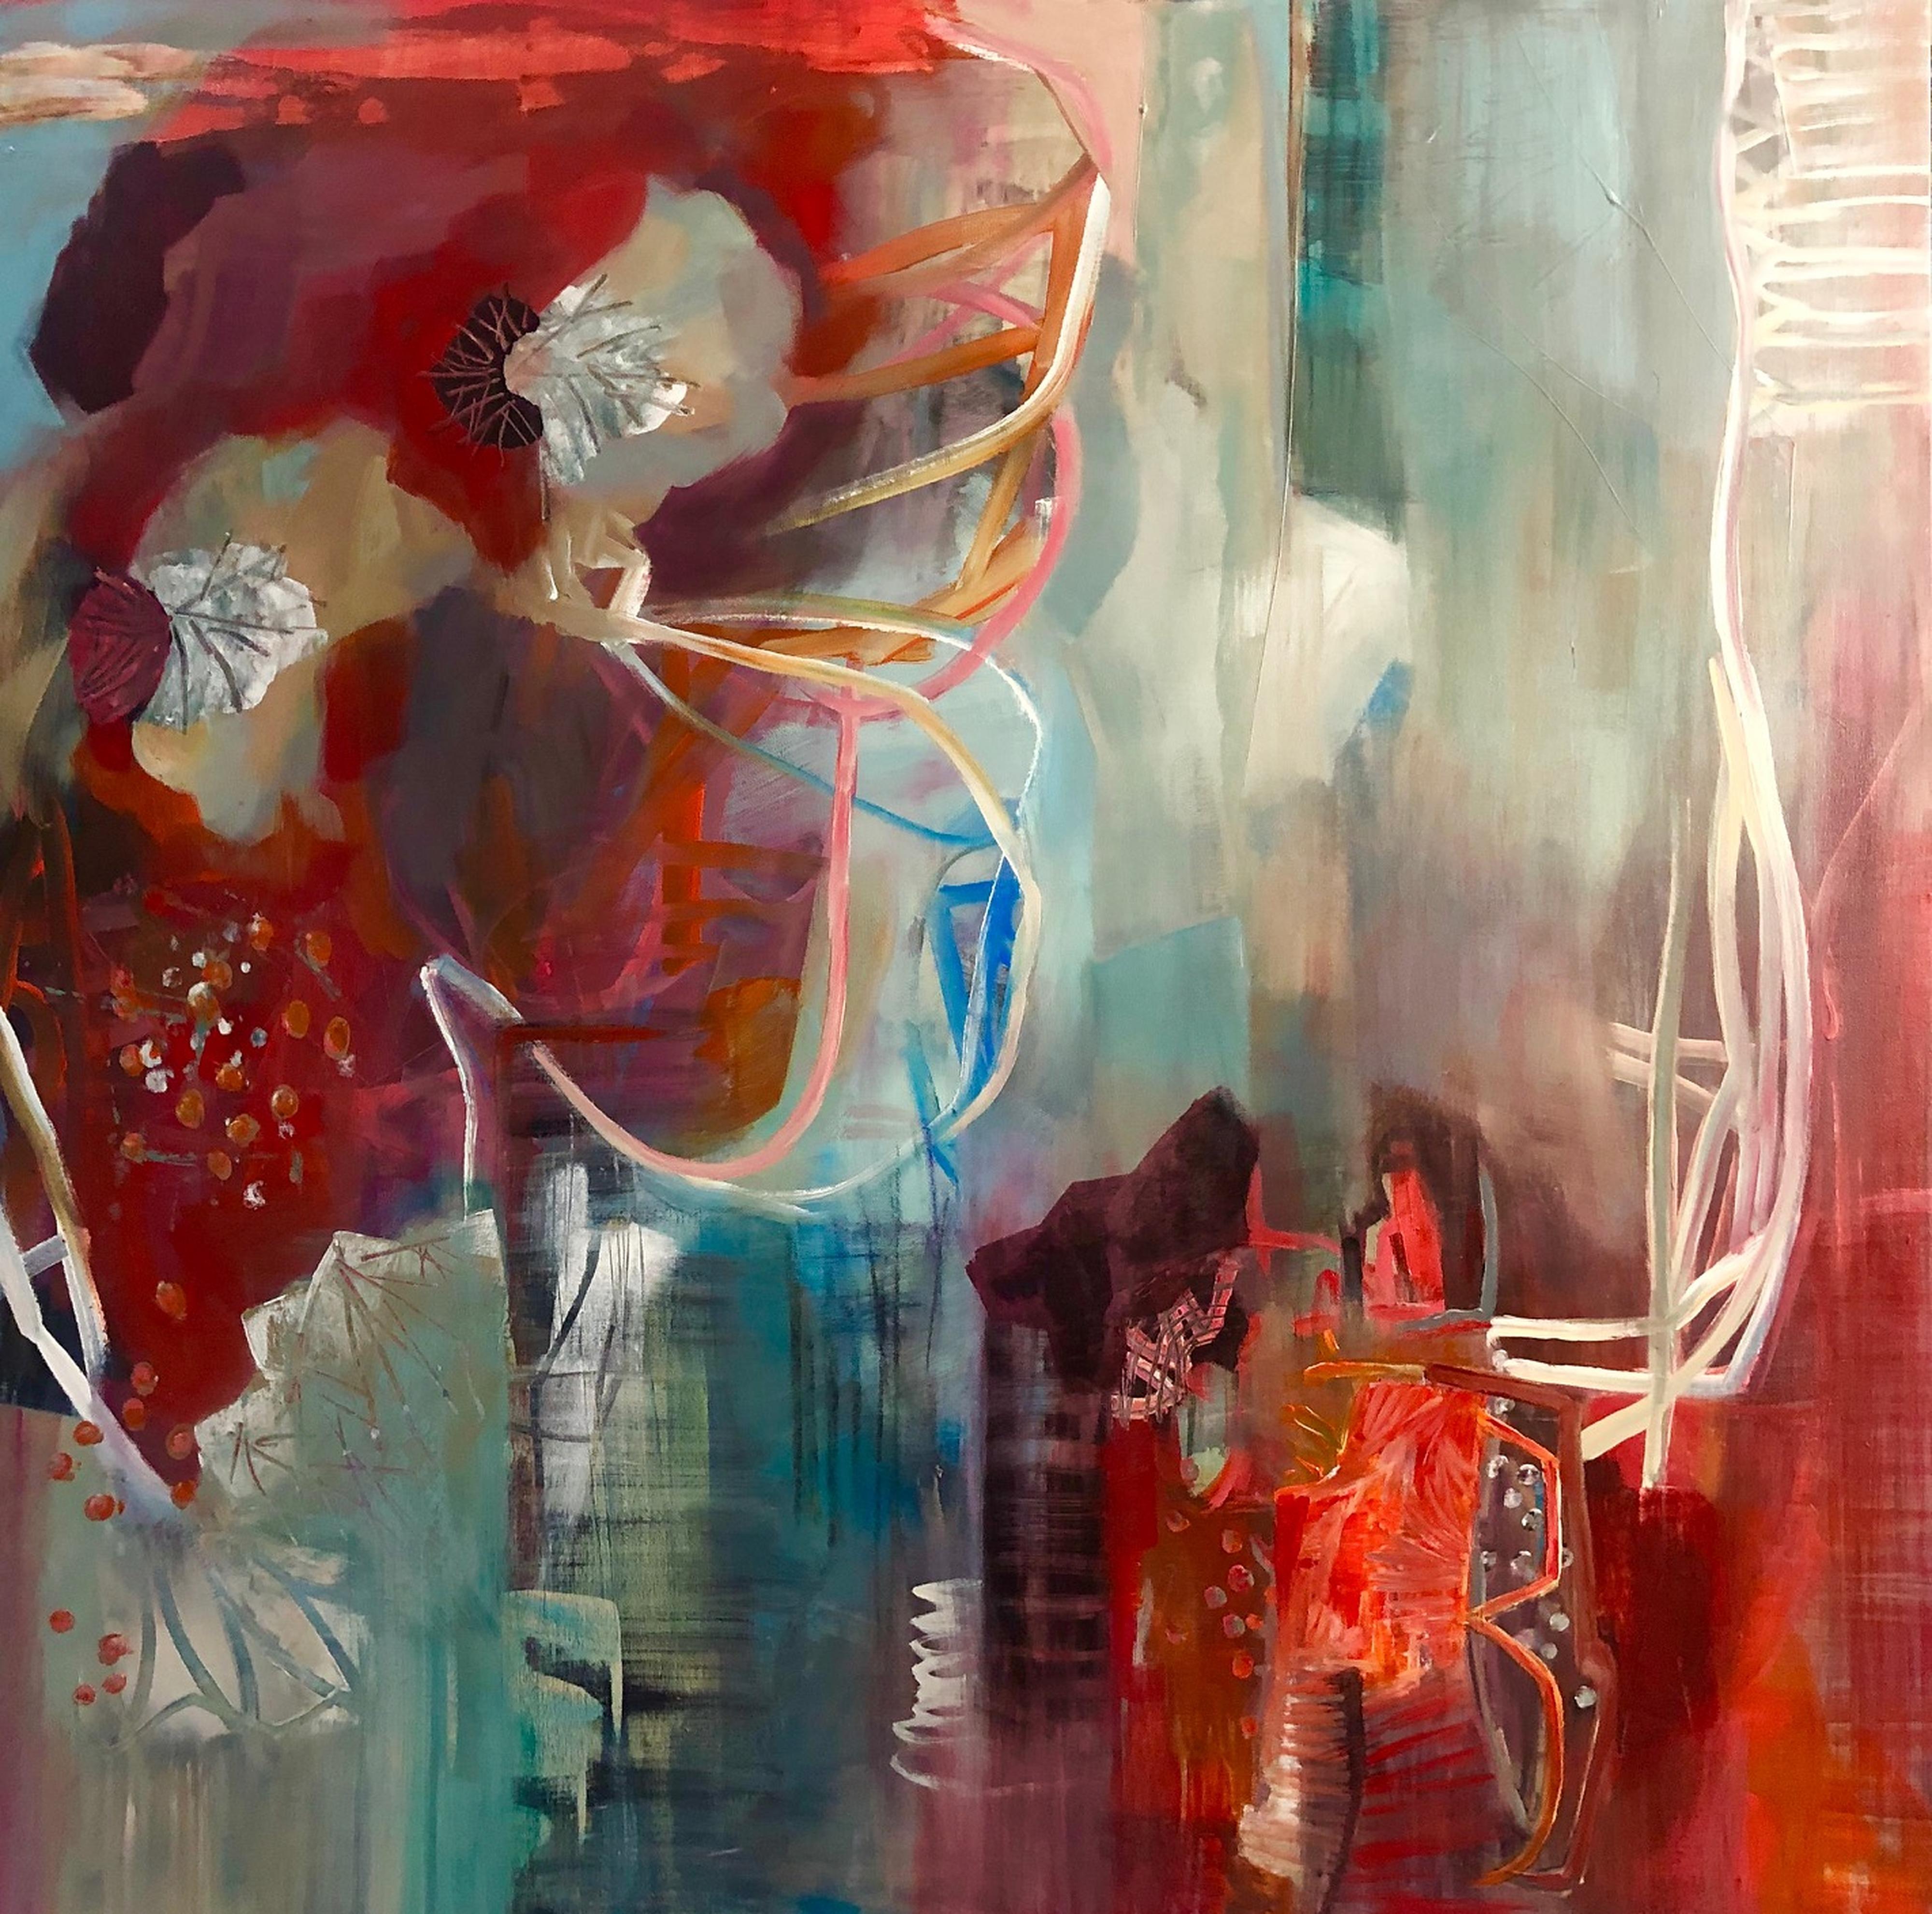 Spicy Summertide by Sarah Van Beckum | ArtworkNetwork.com